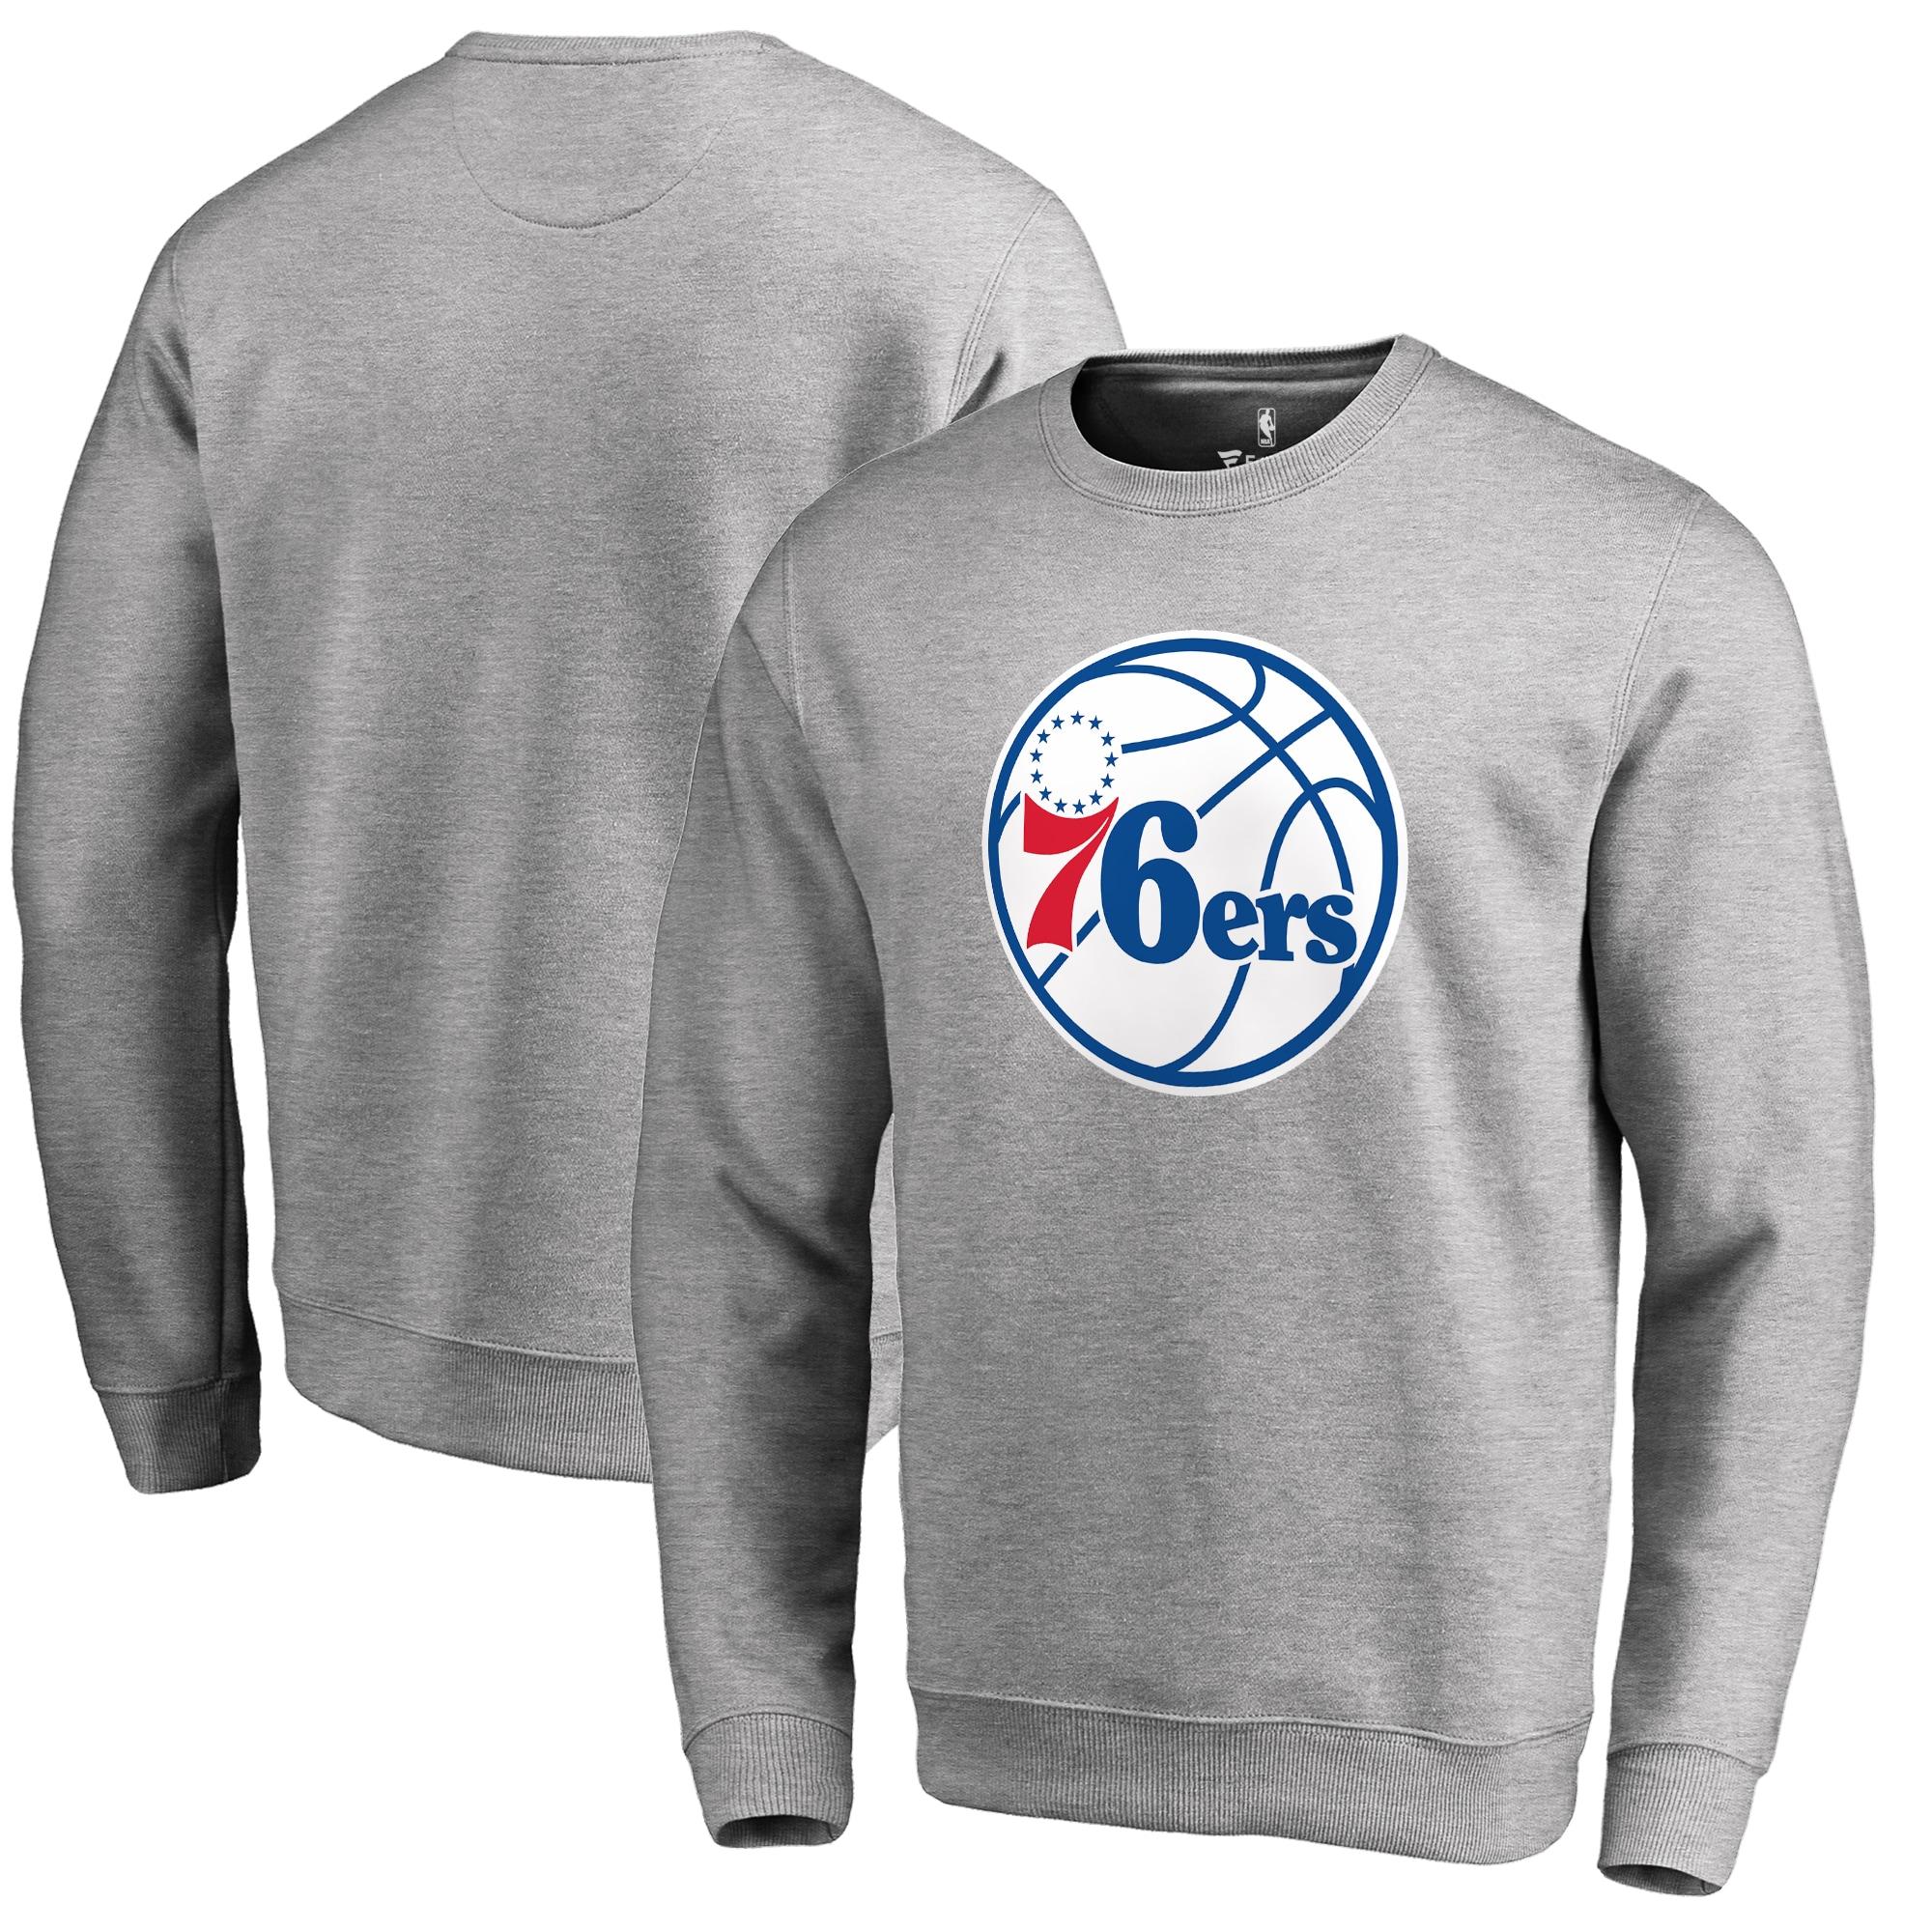 Philadelphia 76ers Fanatics Branded Primary Logo Sweatshirt - Heathered Gray